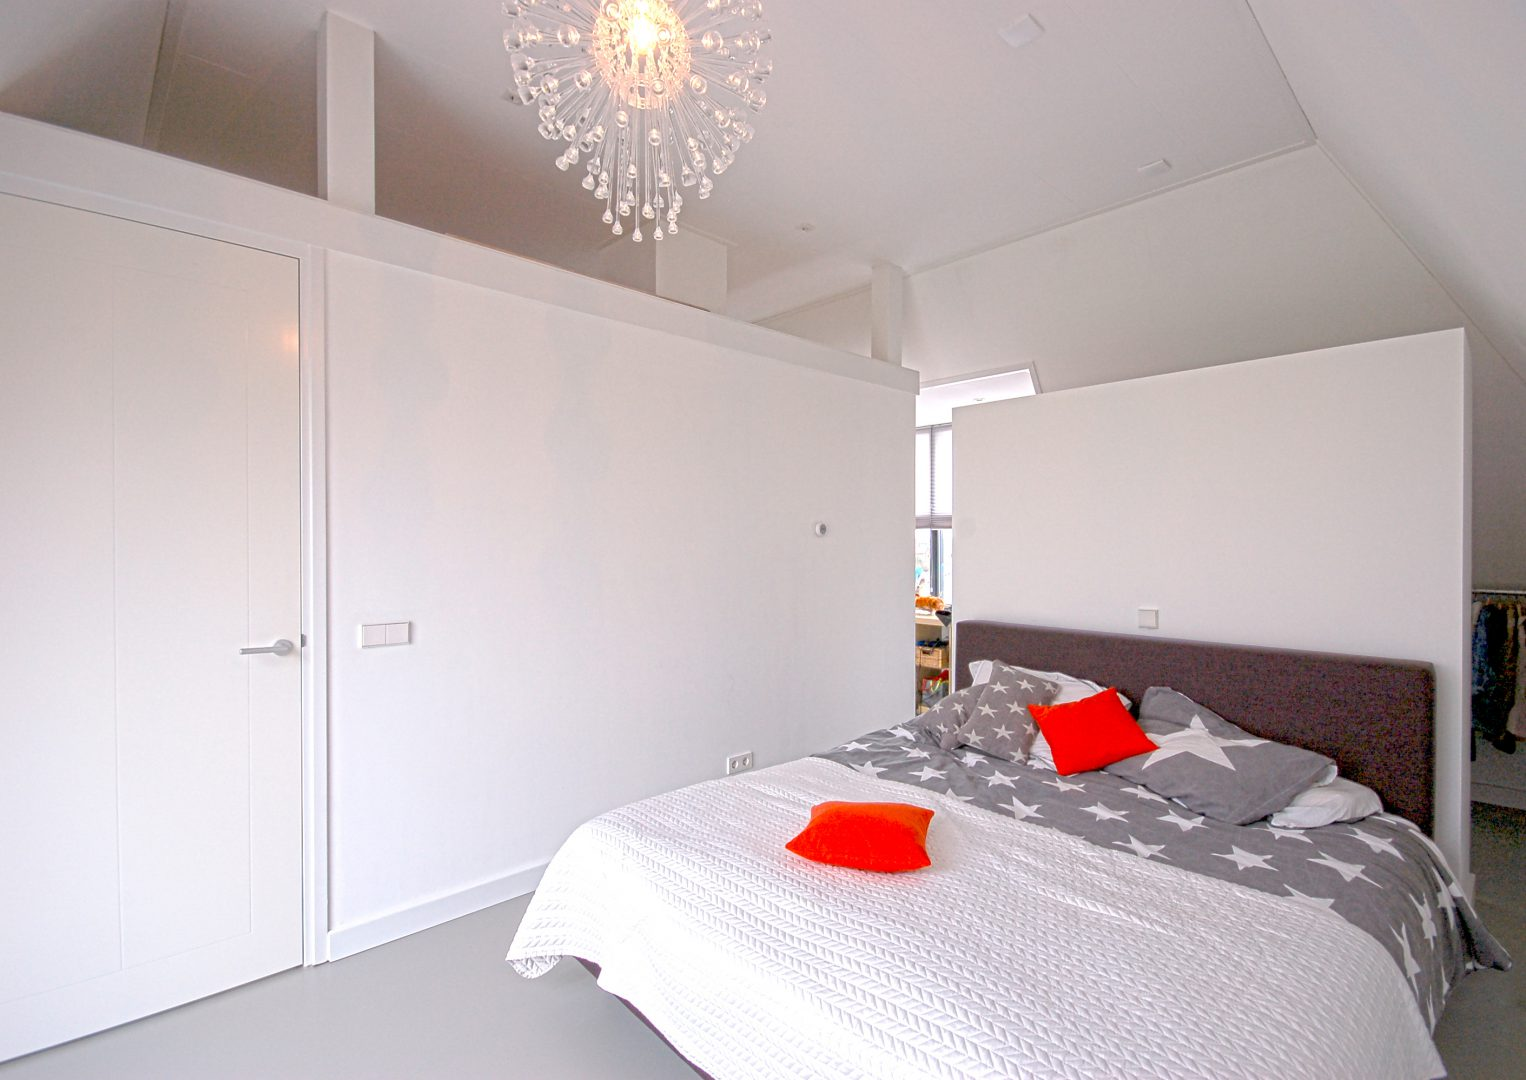 Duurzame Villa te Limmen Zijlstra Schipper Architecten Noord-Holland slaapkamer v2